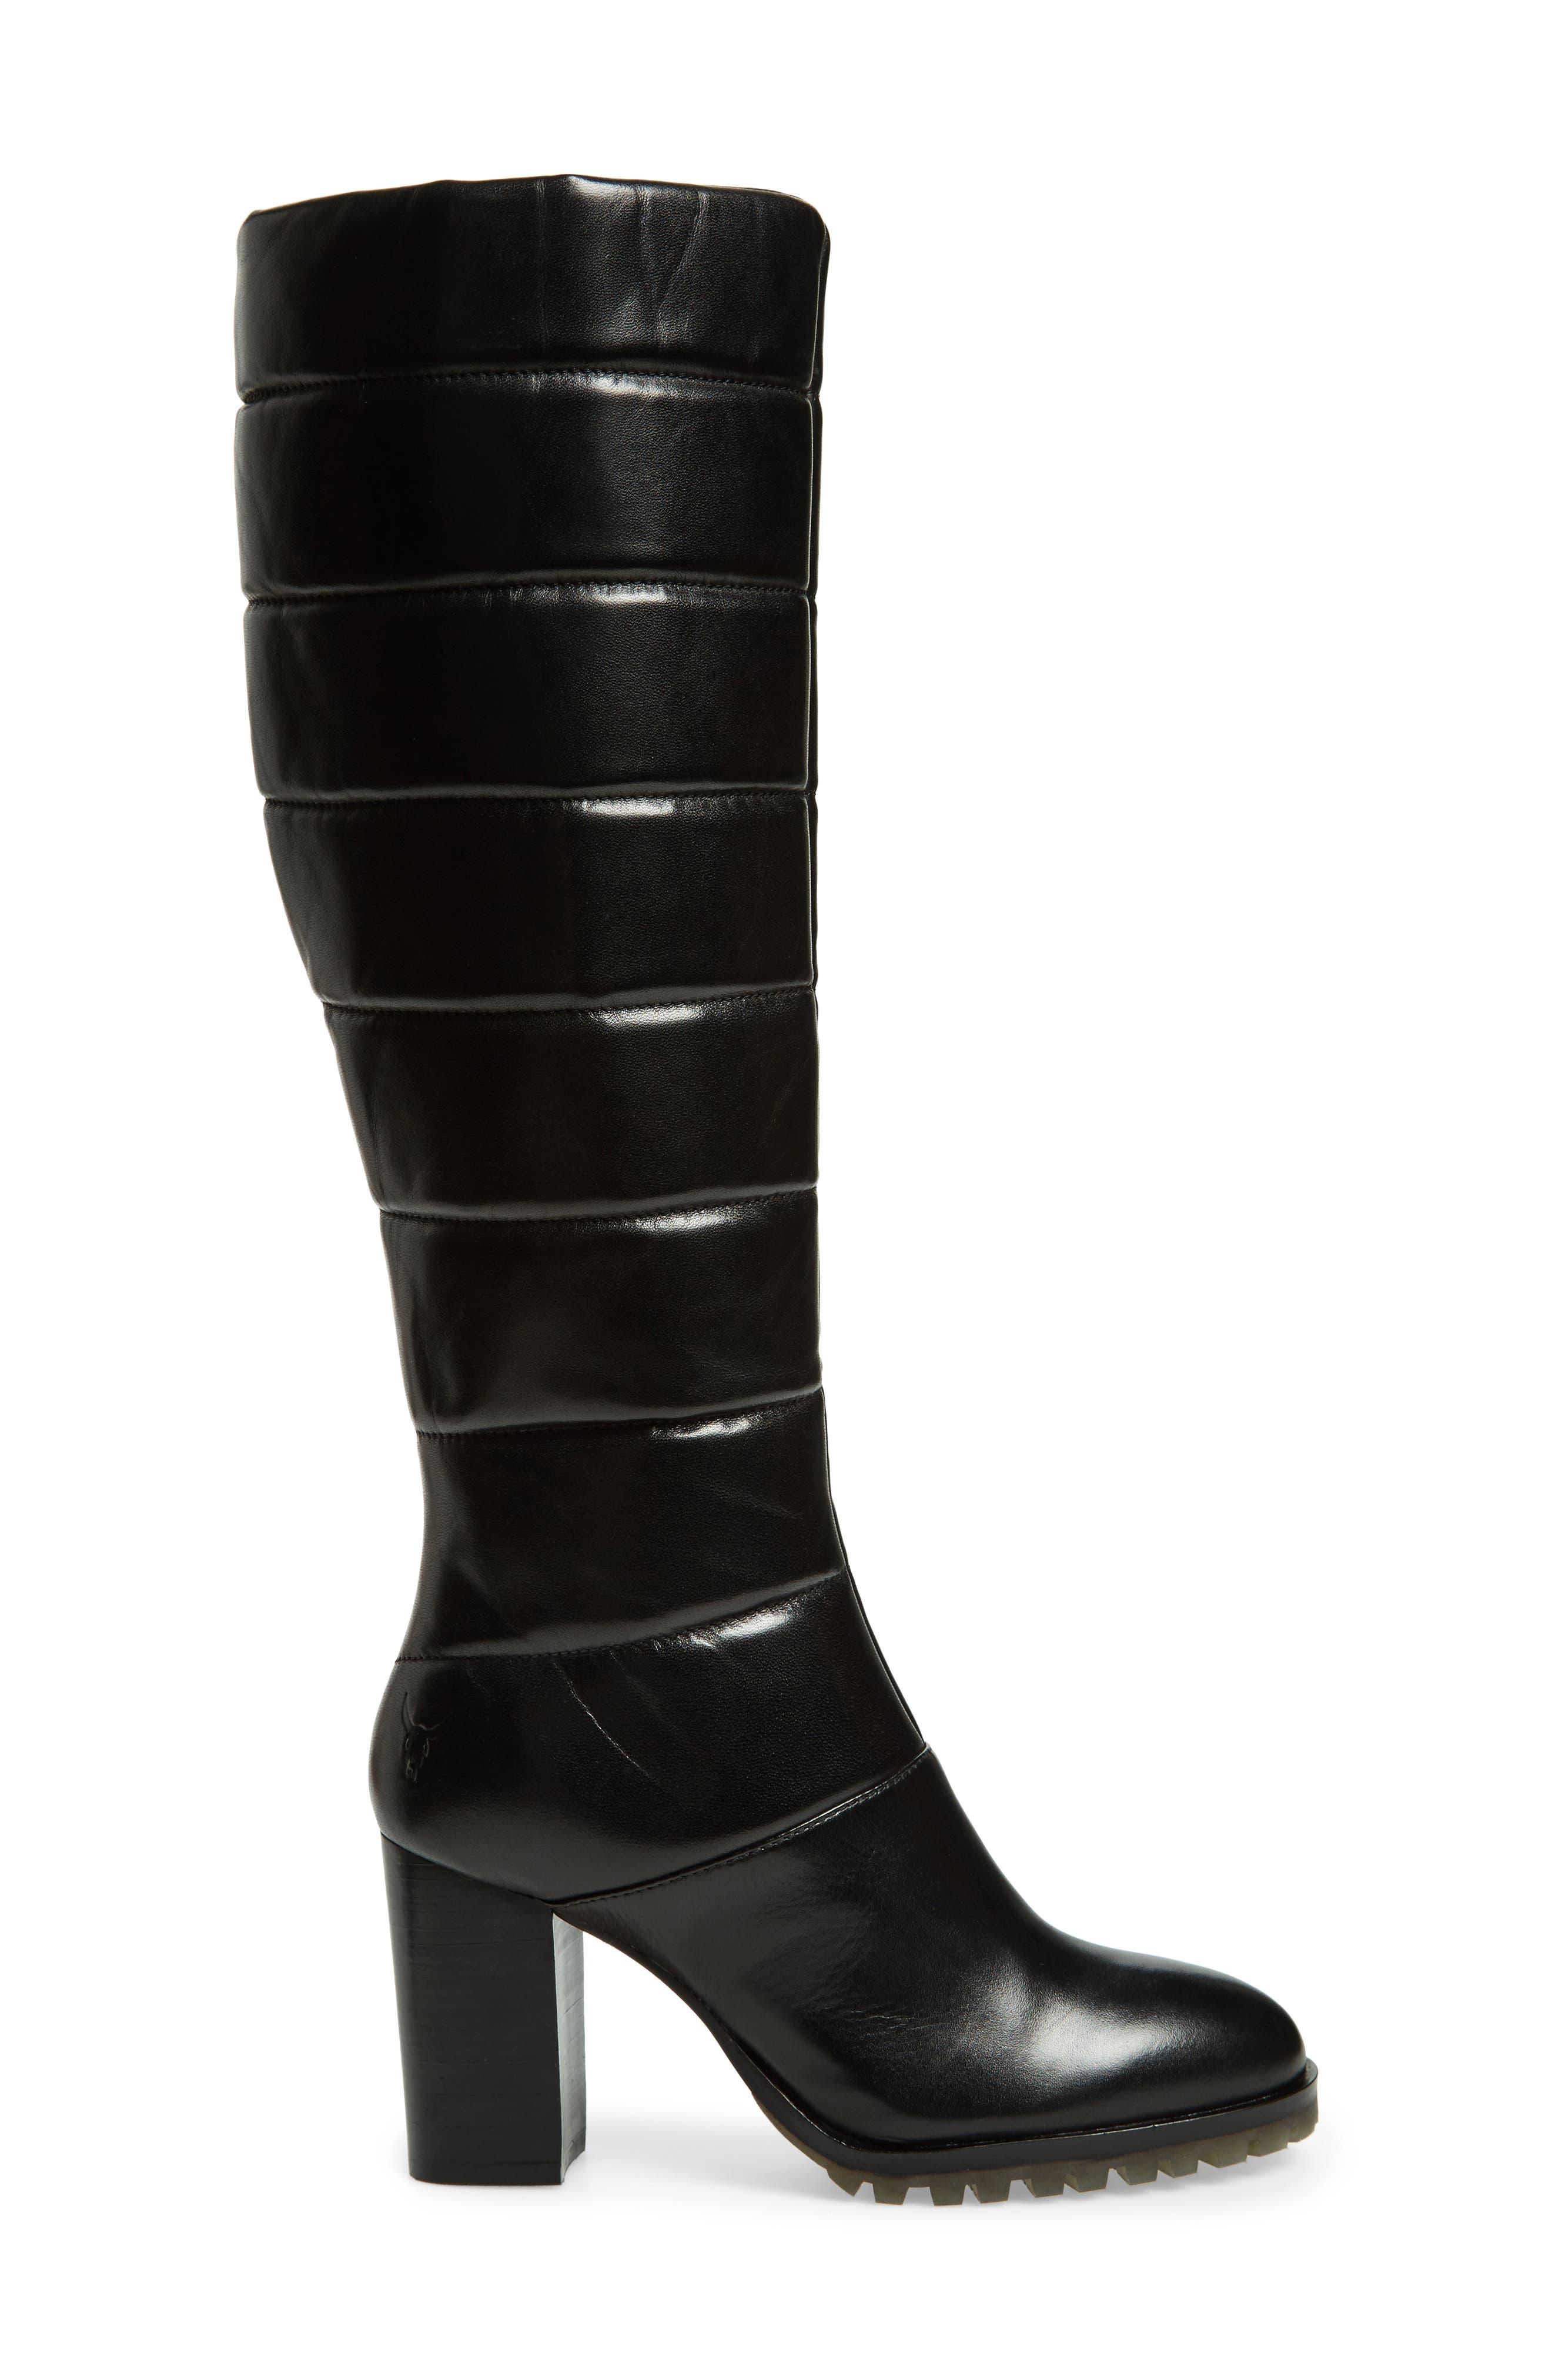 Tropia Knee High Boot,                             Alternate thumbnail 3, color,                             Black Leather